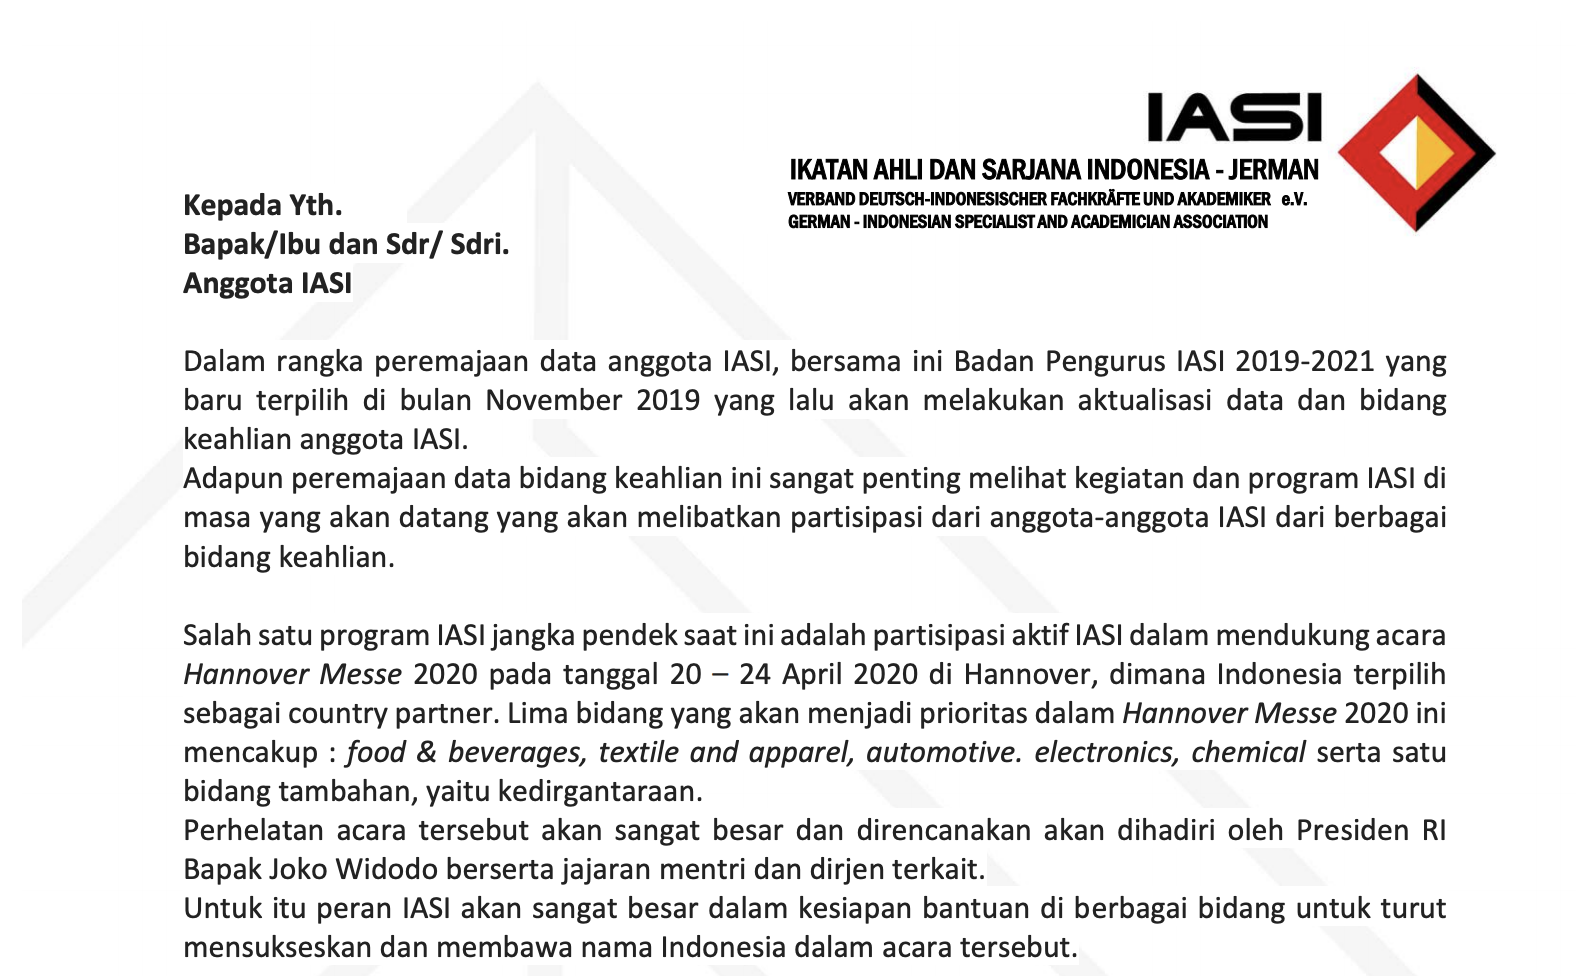 Aktualisasi Anggota IASI 2019-2021